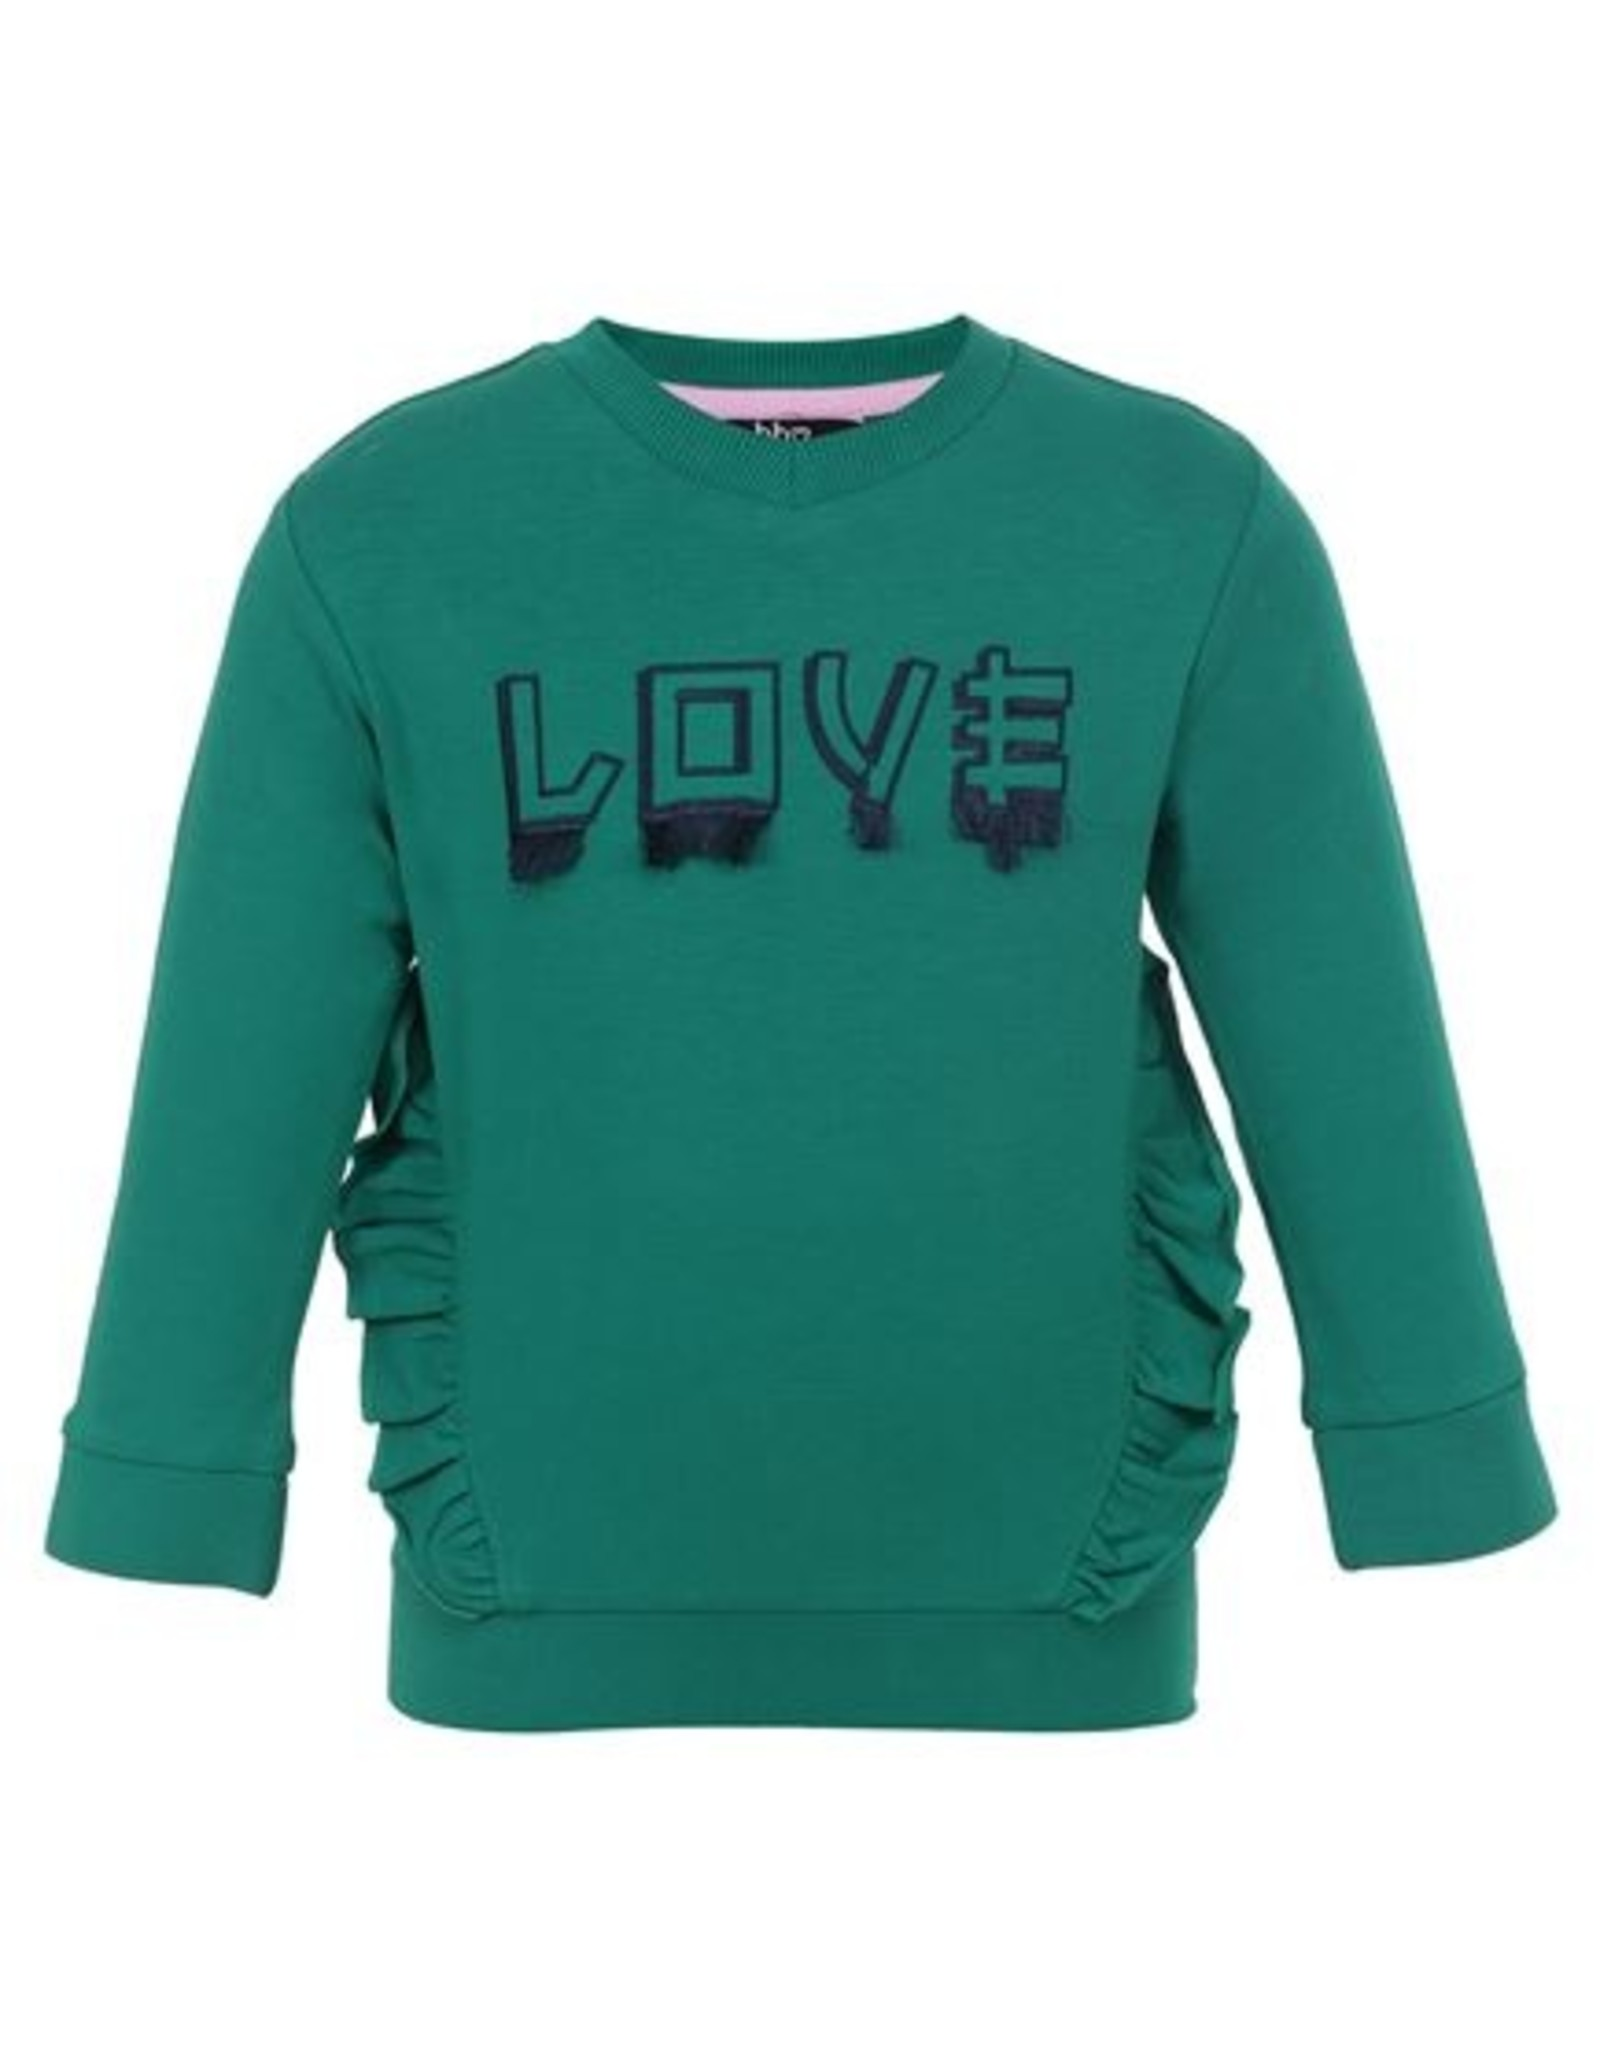 Beebielove Sweater Ruffle, GRN